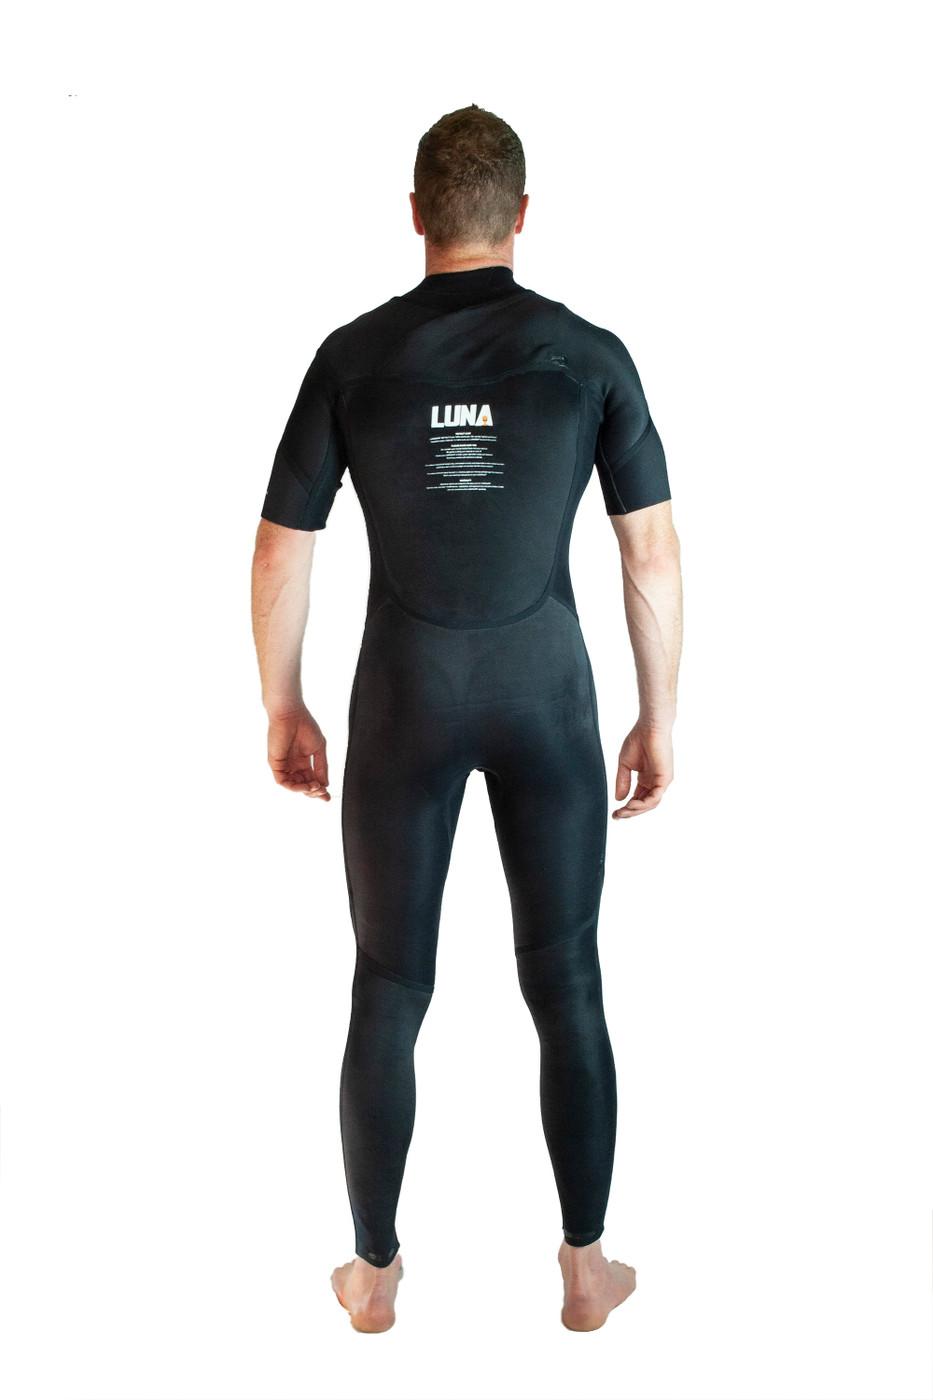 Luna surf wetsuits